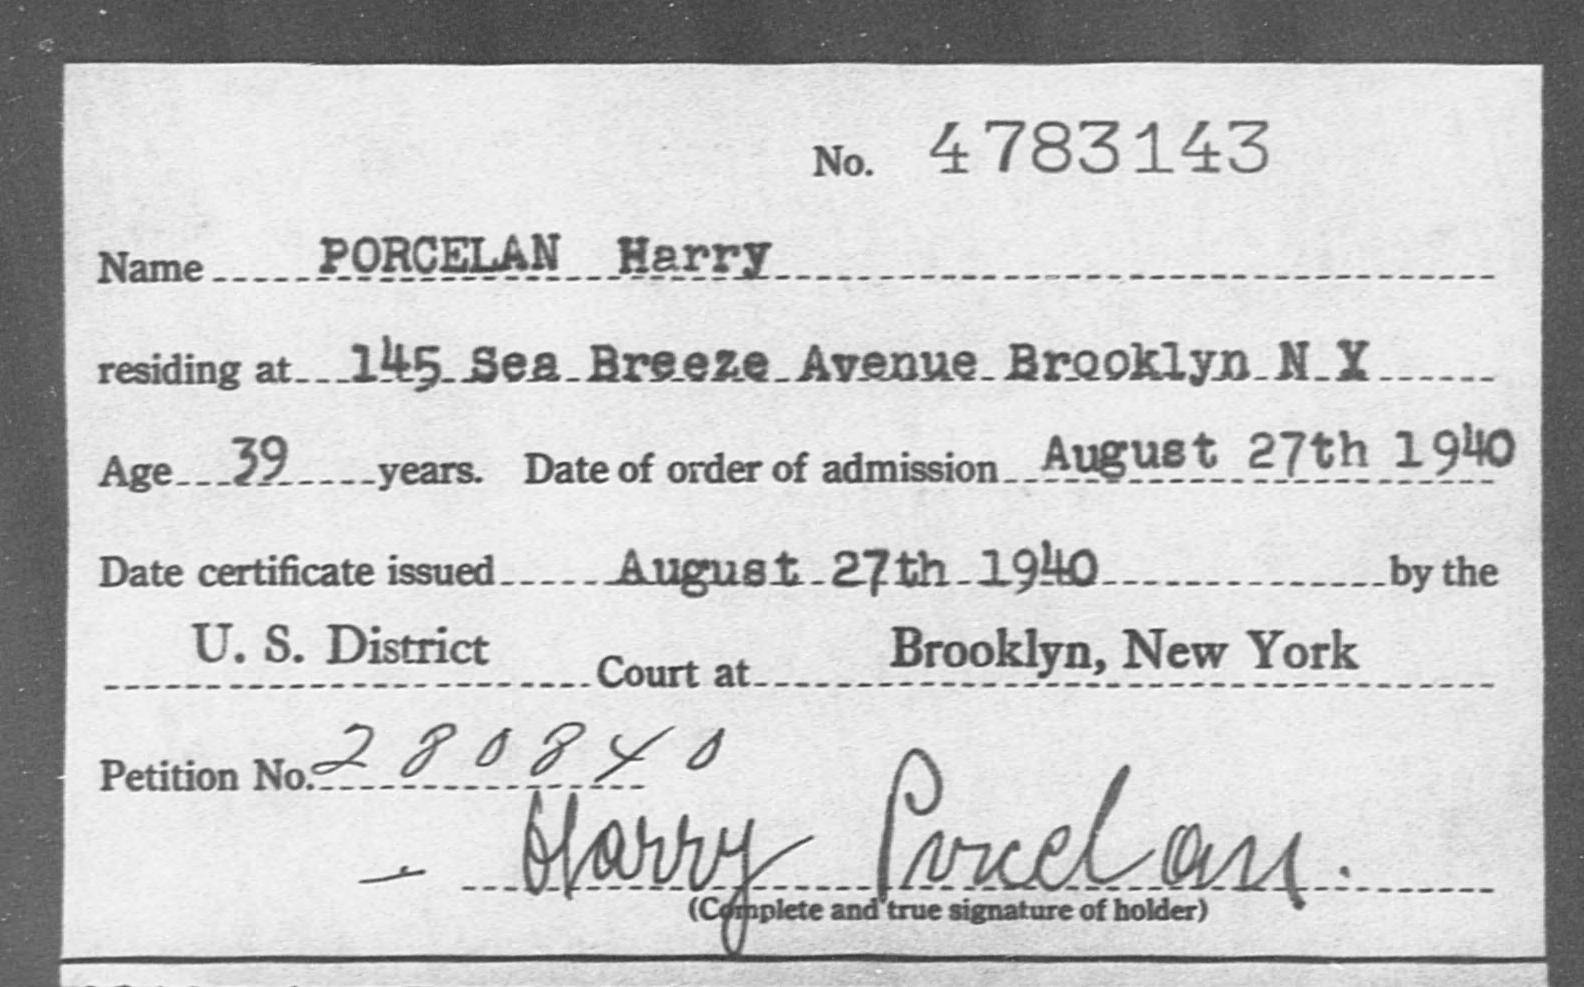 PORCELAN Harry - Born: [BLANK], Naturalized: 1940